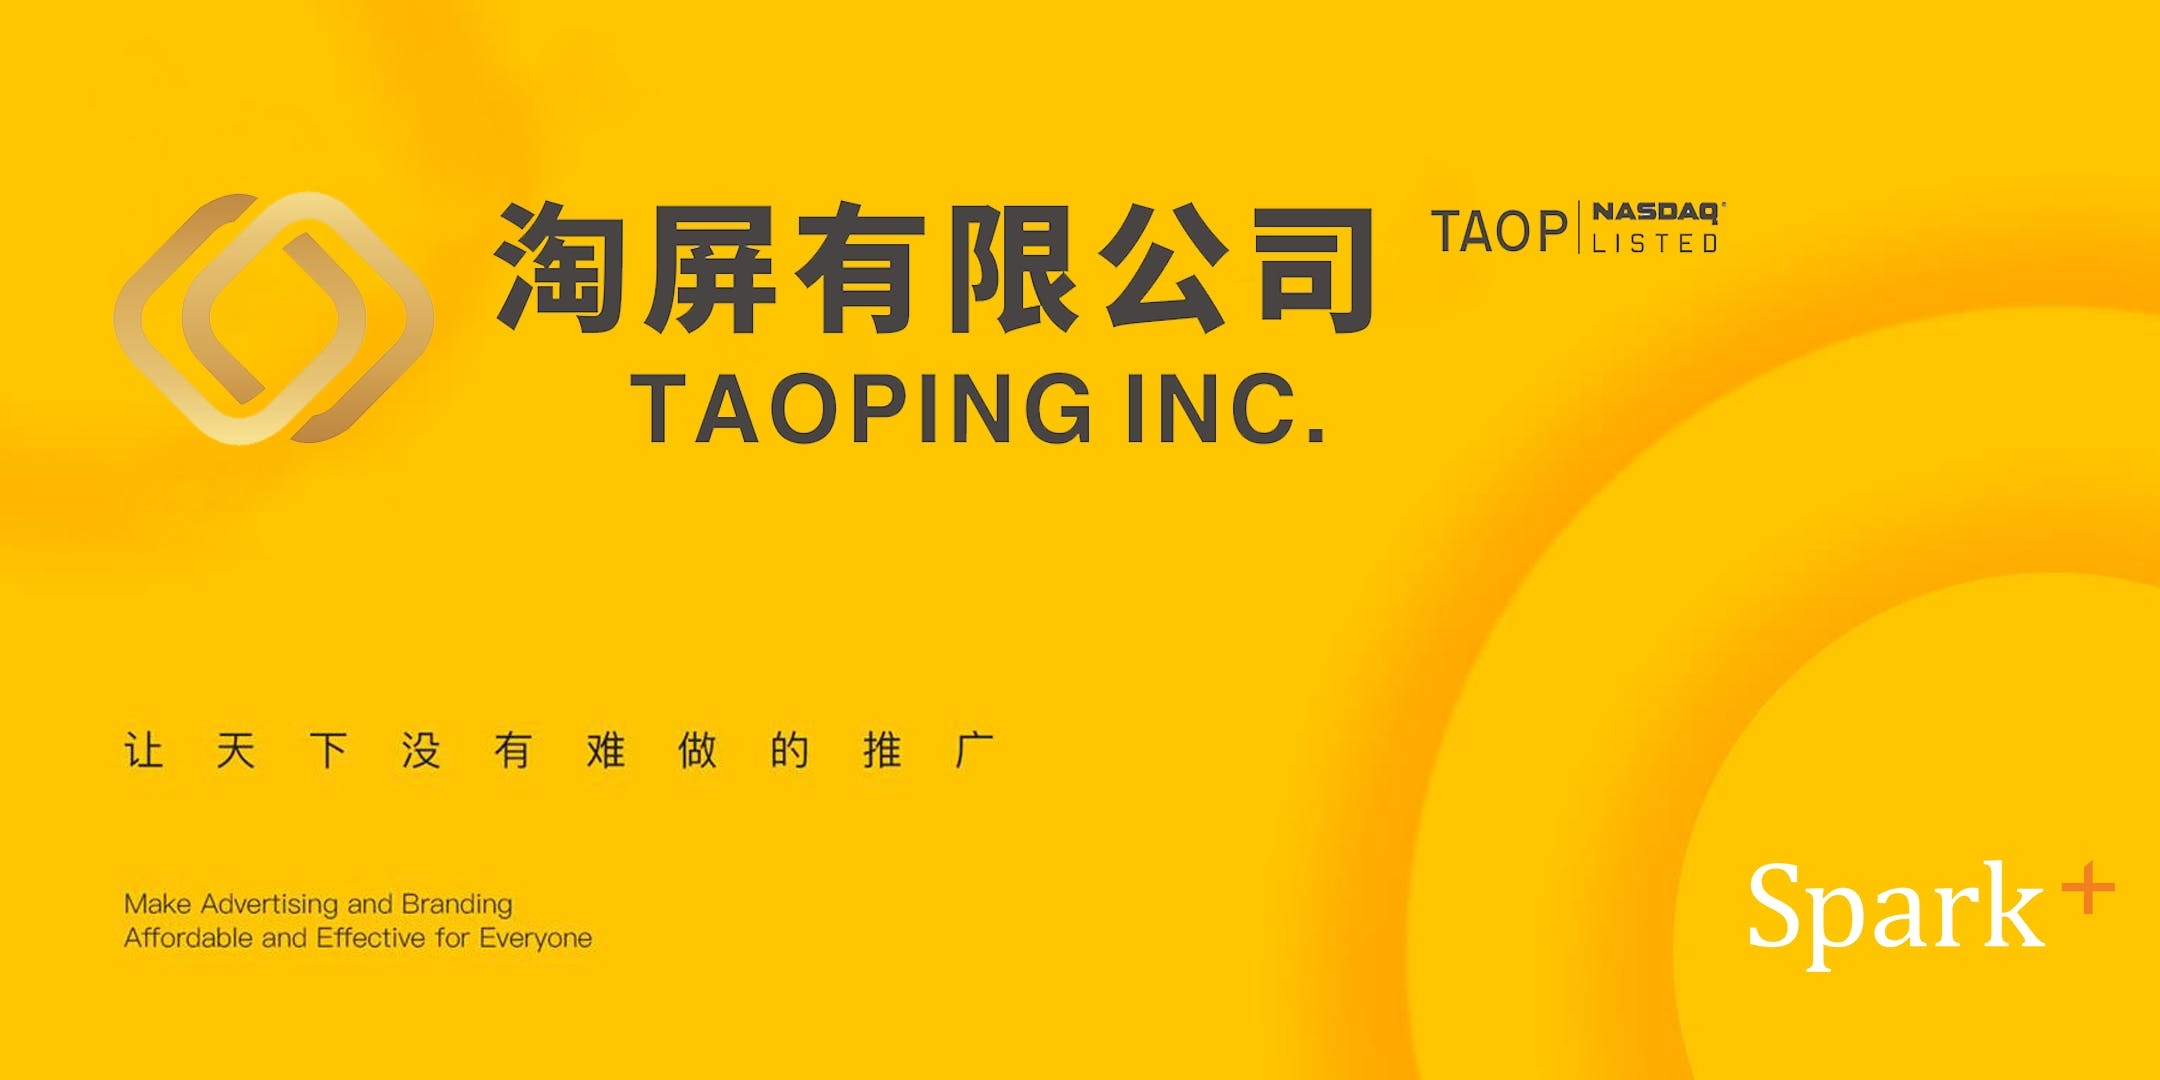 TAOP Signs Memorandum of Understanding to Establish Cryptocurrency Mining Joint